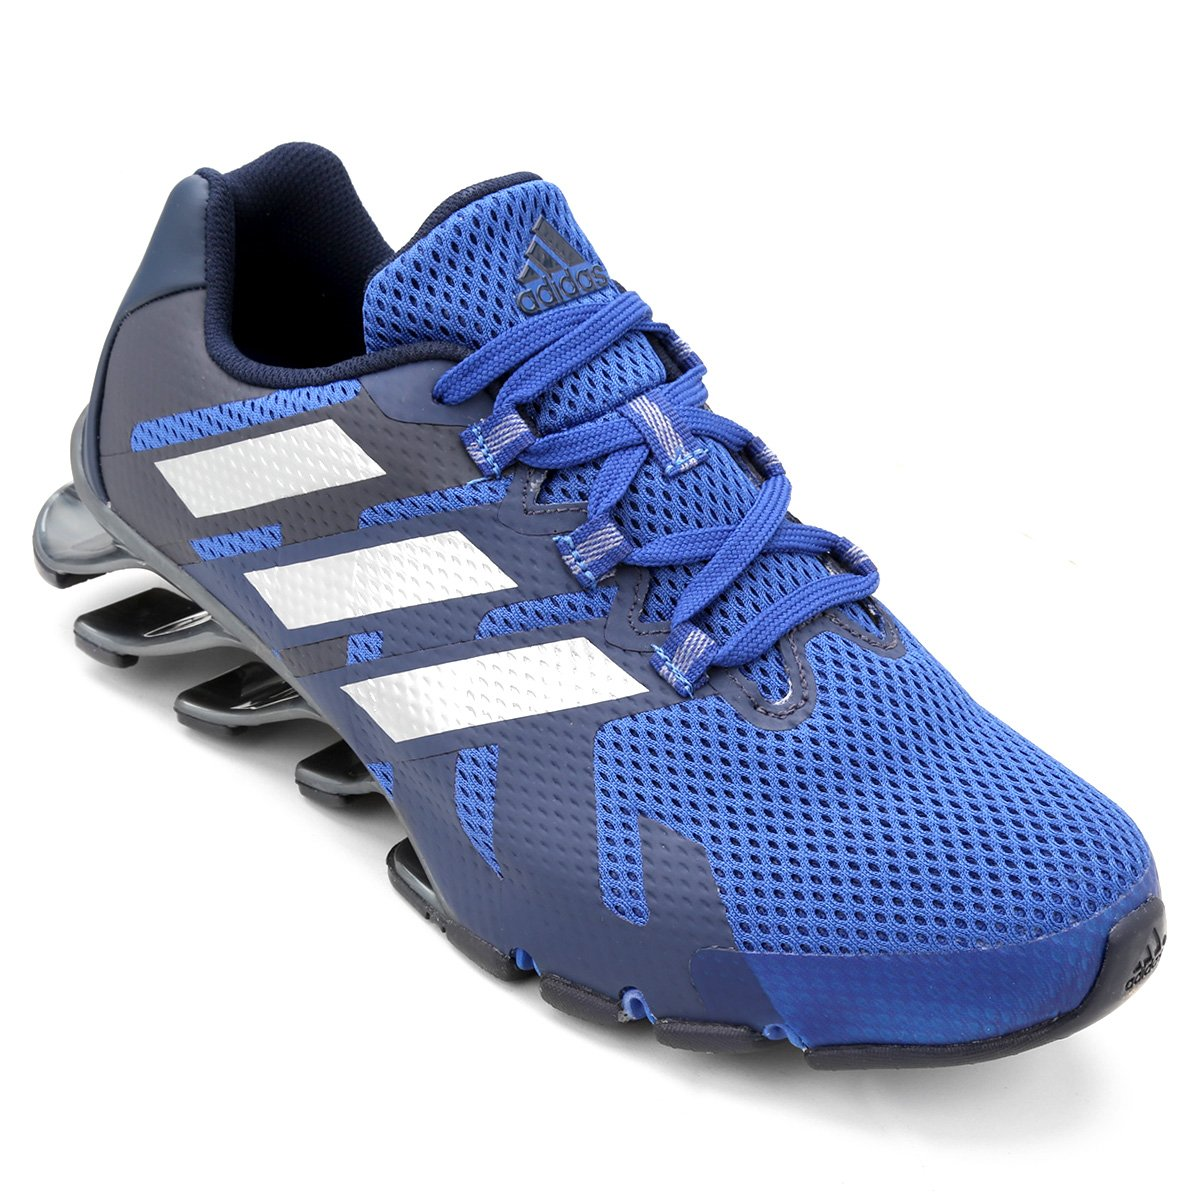 b887a90633a Tenis Adidas Springblade Eforce m